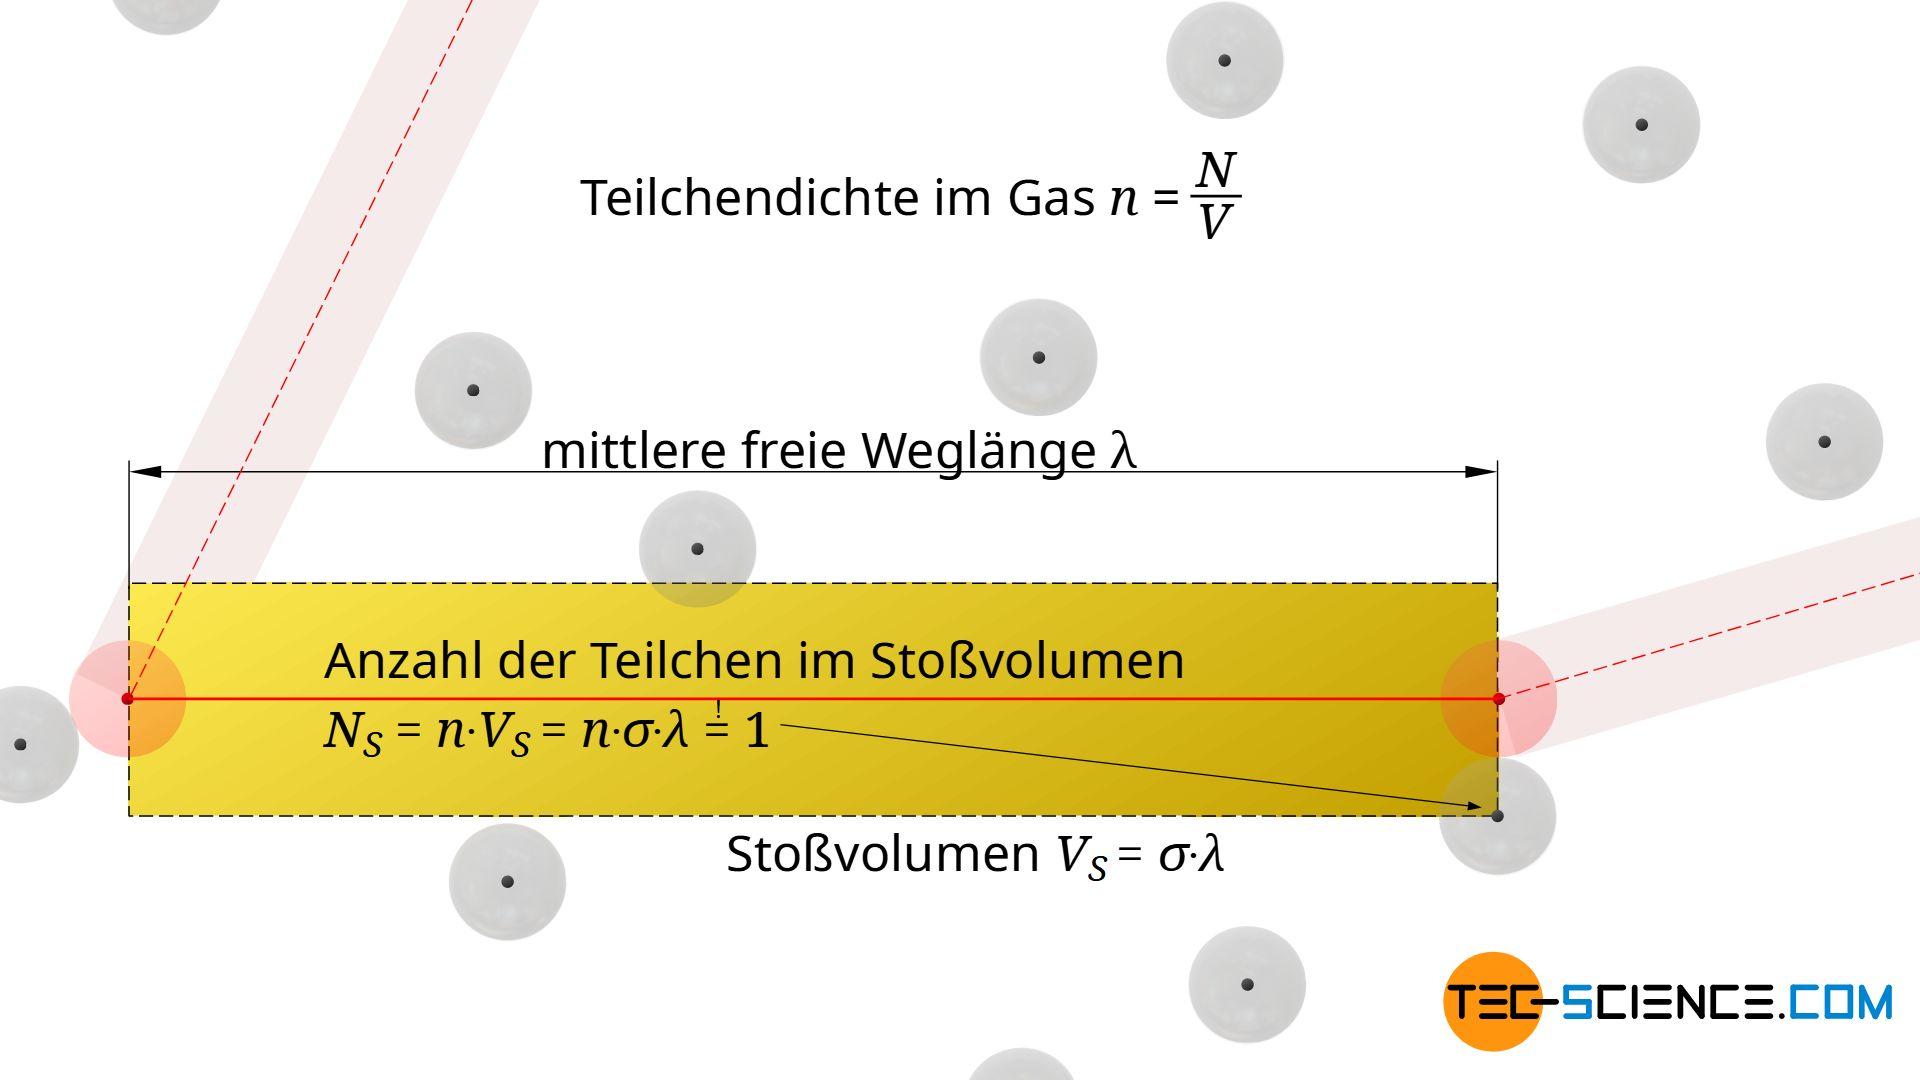 Stoßzylinder (Stoßvolumen)